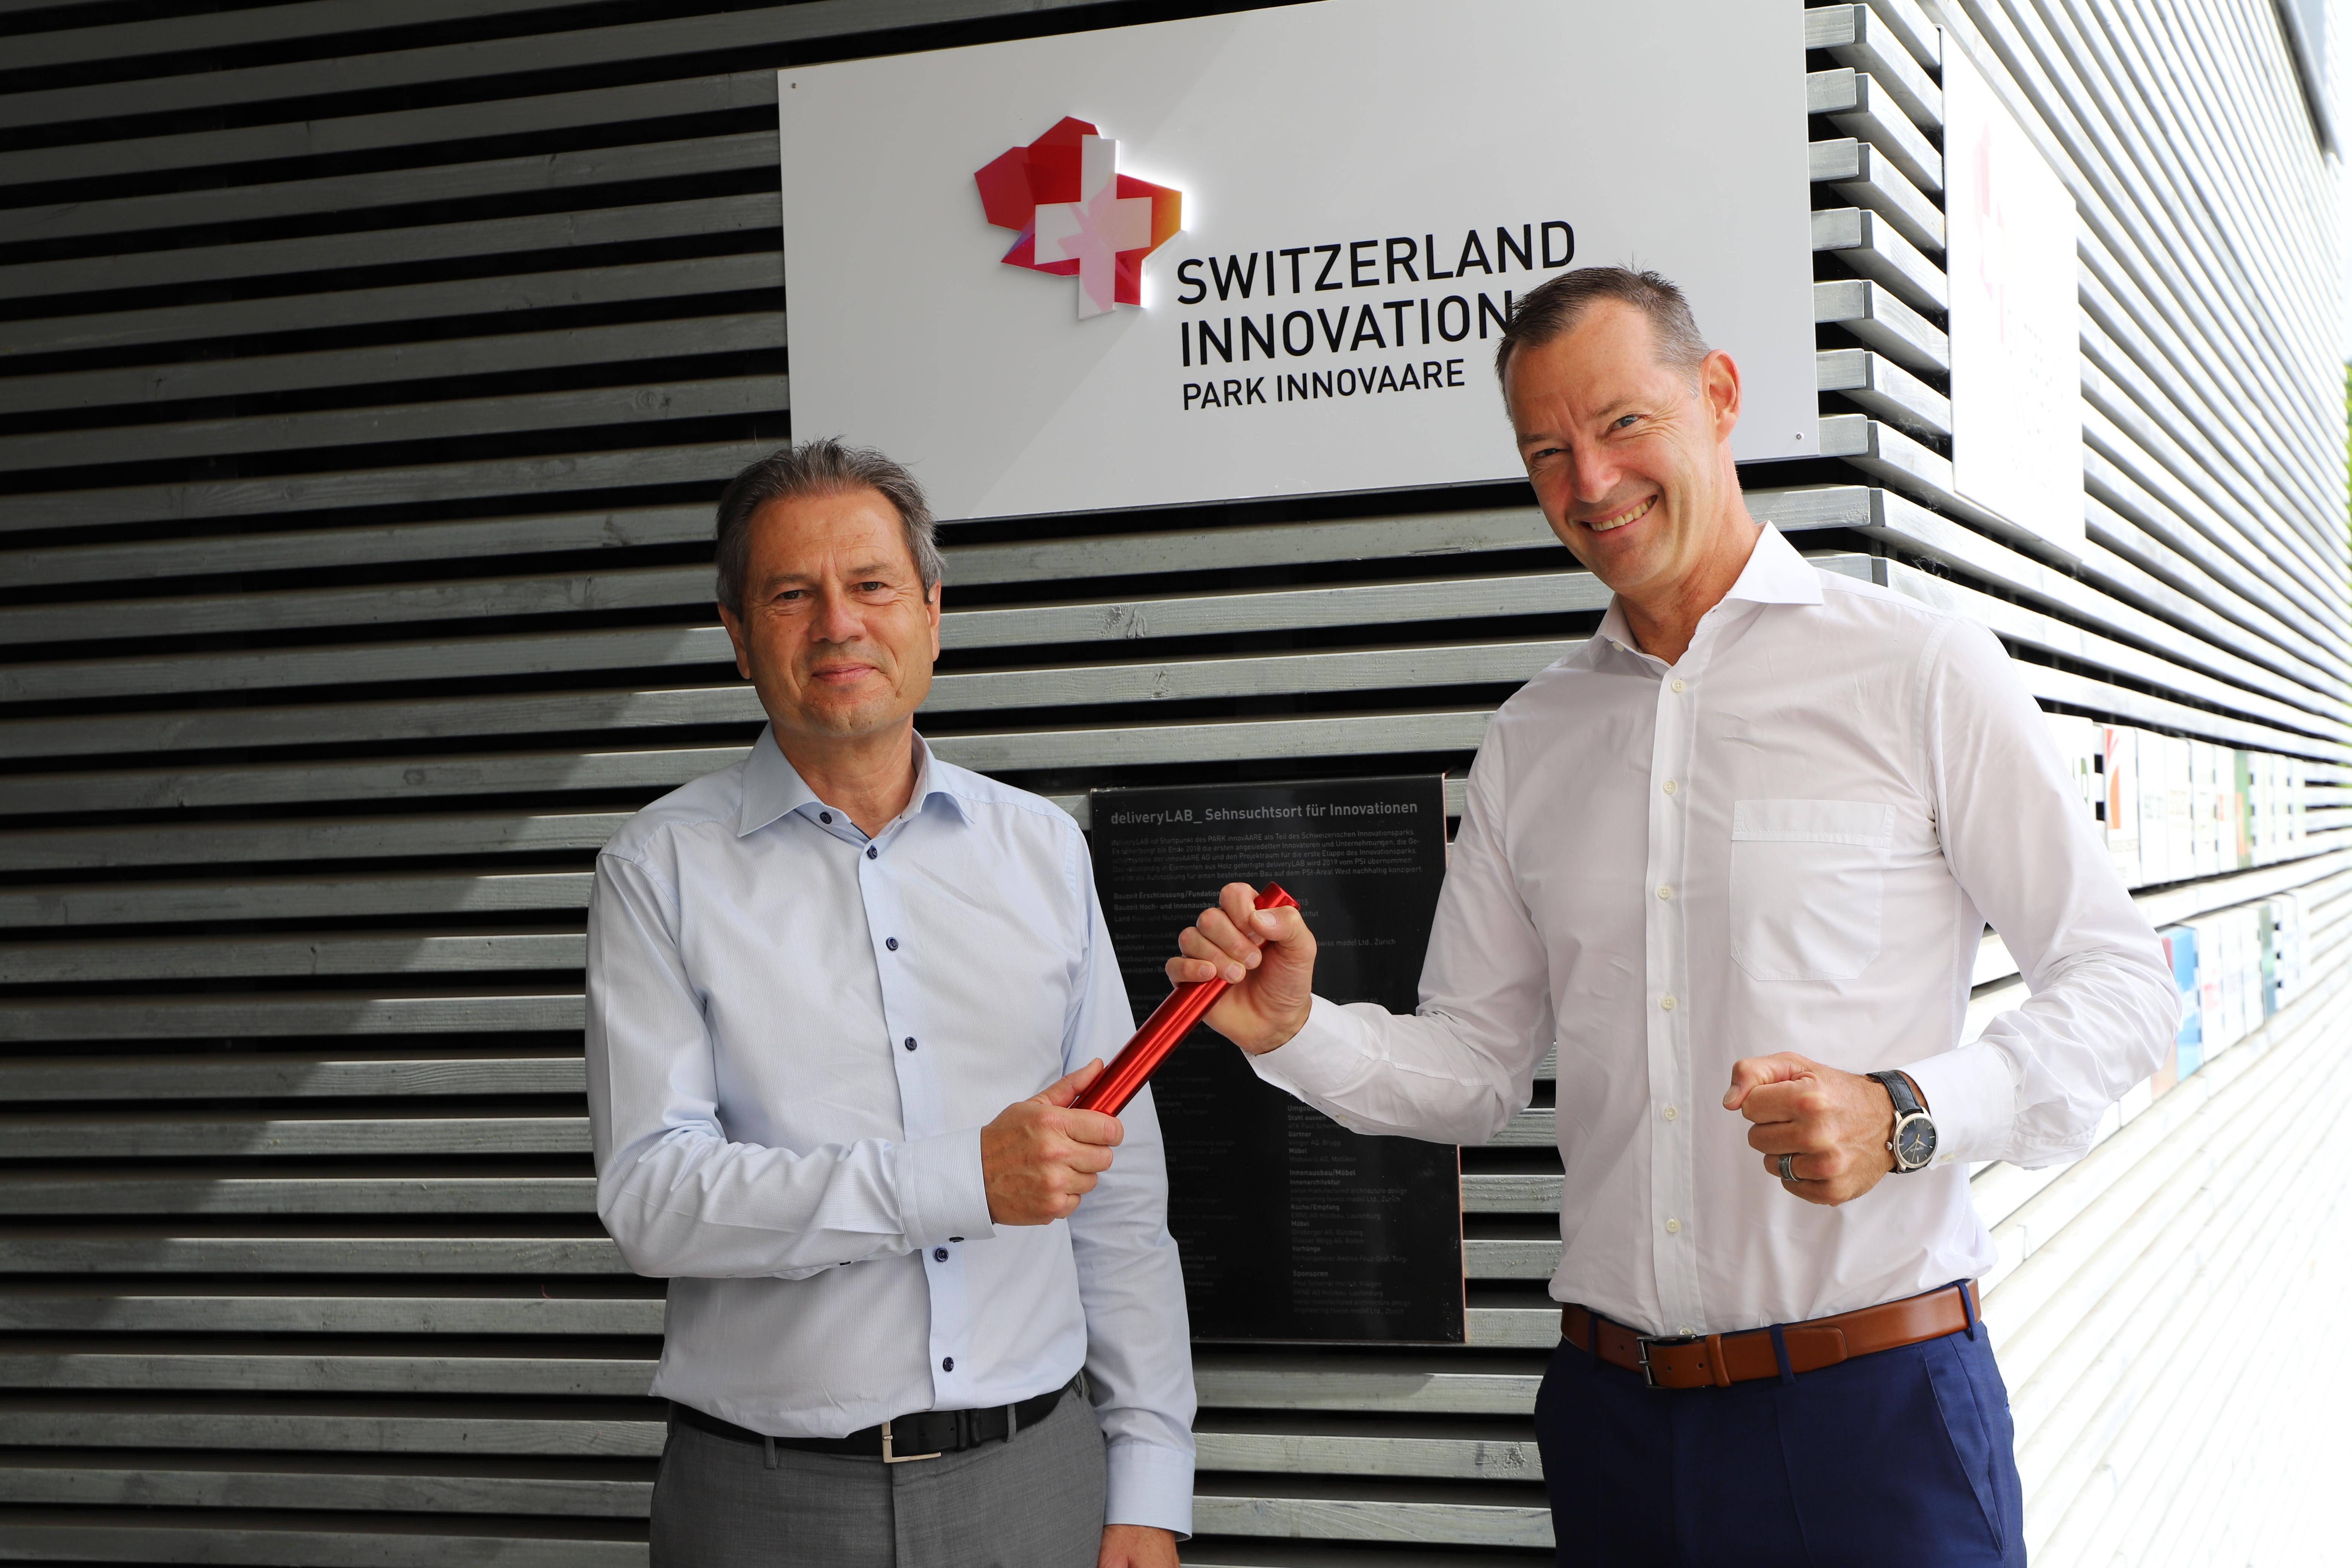 Stabsübergabe: Dr. Remo Lütolf (links) übergibt sein Amt als VR-Präsident innovAARE AG an Dr. Christian Brönnimann